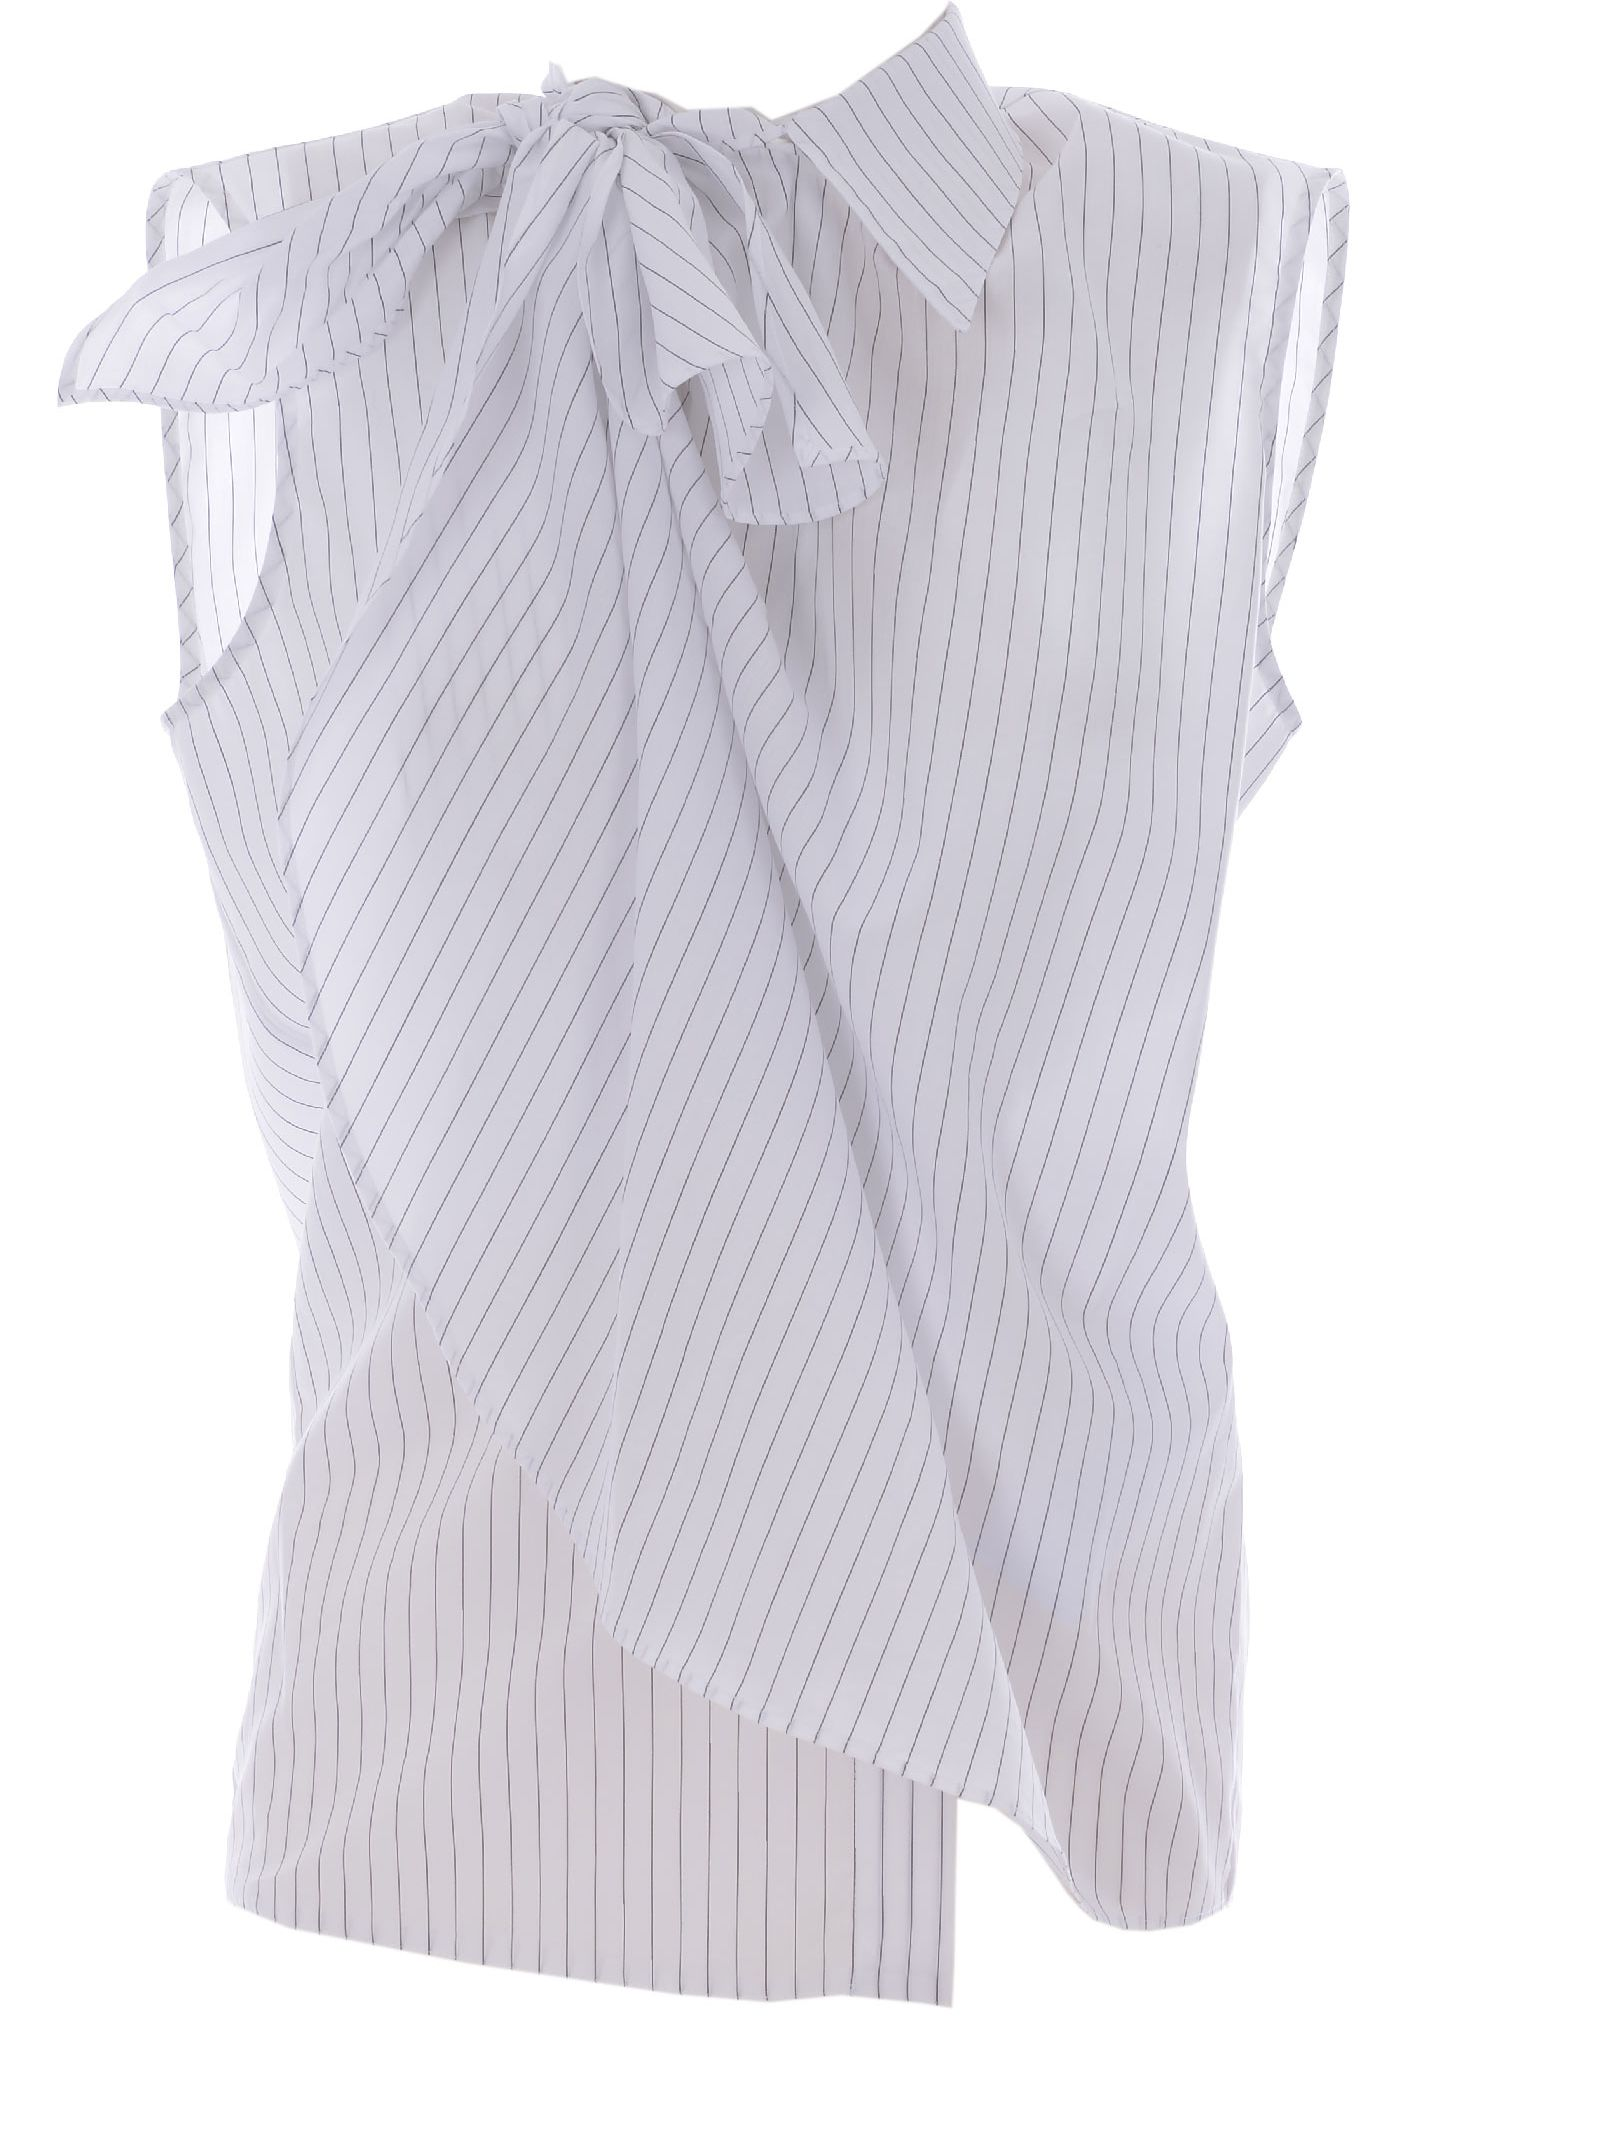 Mm6 Maison Margiela Striped Shirt